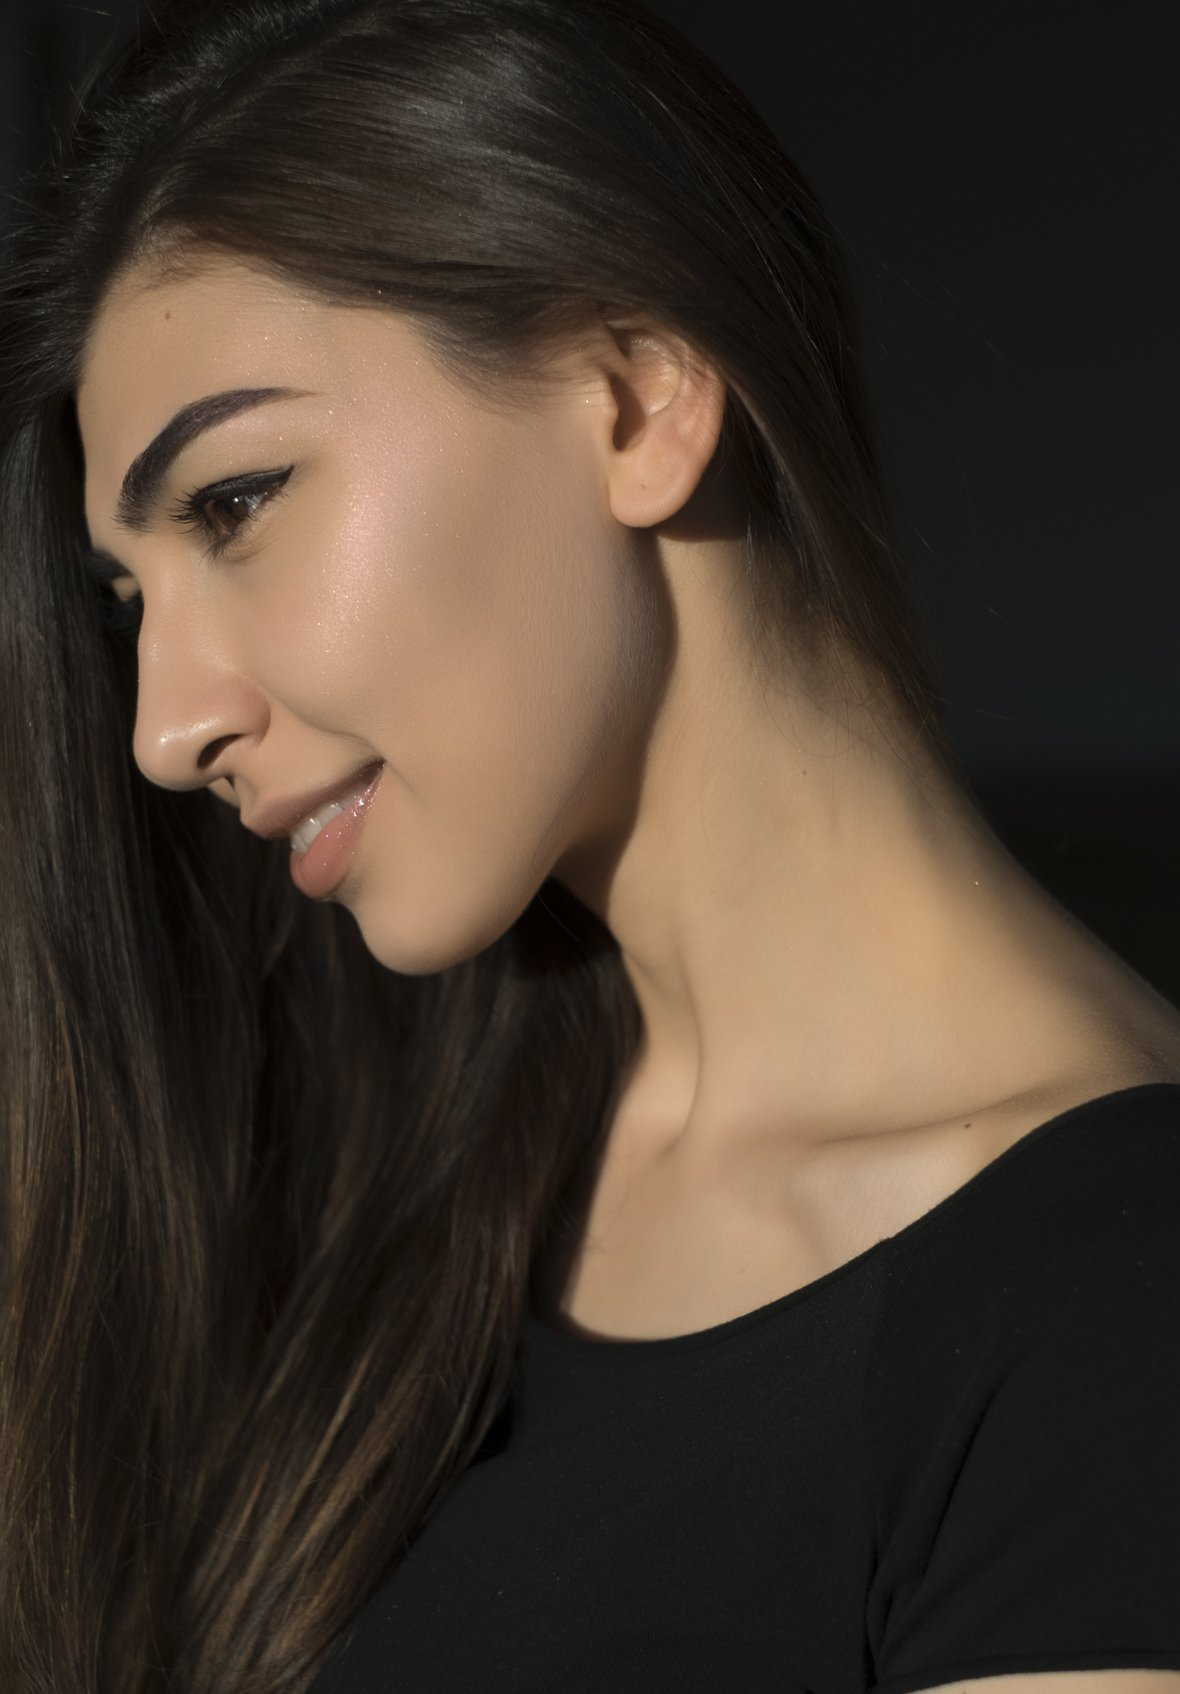 sunkissedblush-pat-mcgrath-Skin-Fetish-Sublime-Skin-Highlighting-Trio (24 of 30)